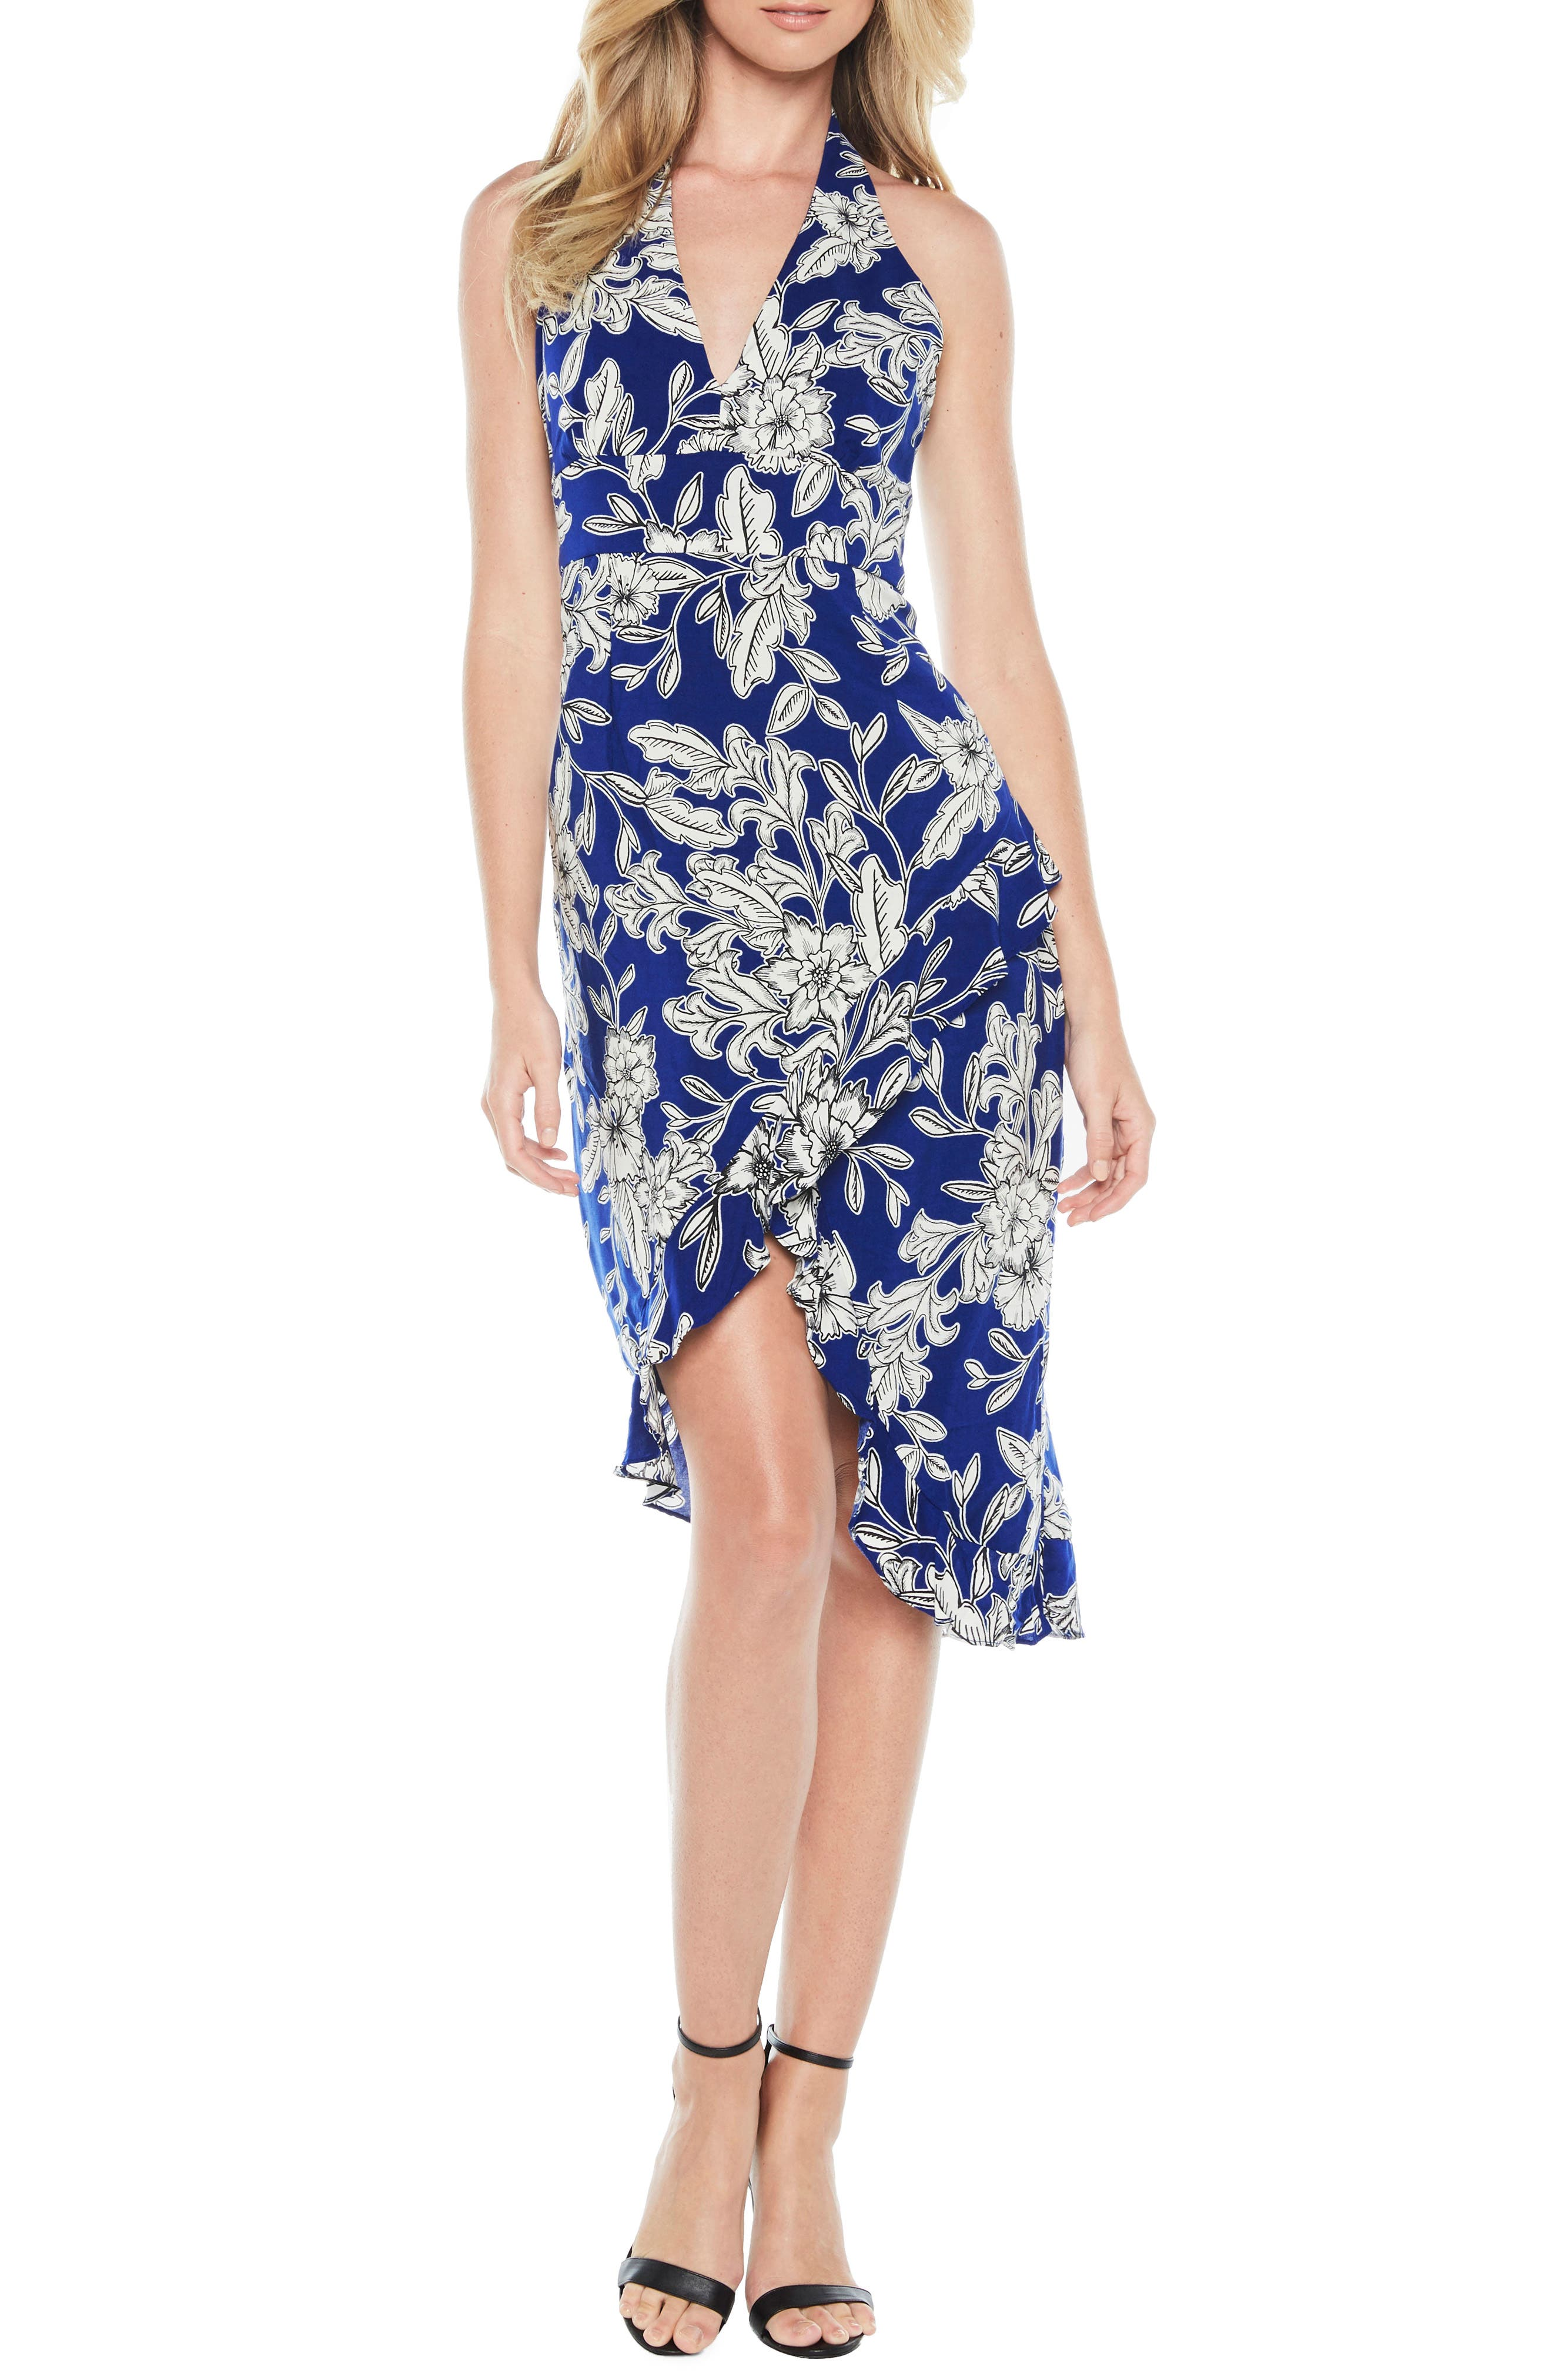 Petra Floral Dress,                             Main thumbnail 1, color,                             493